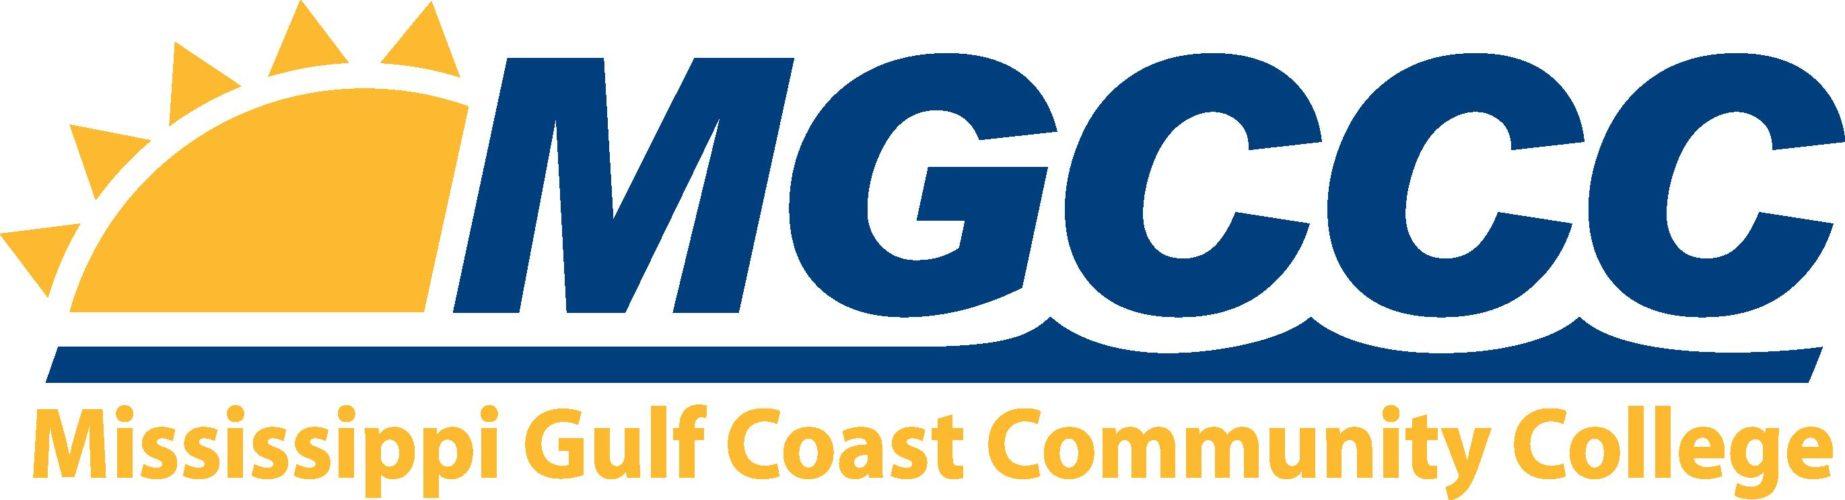 Mississippi Gulf Coast Community College - Web Development Technology